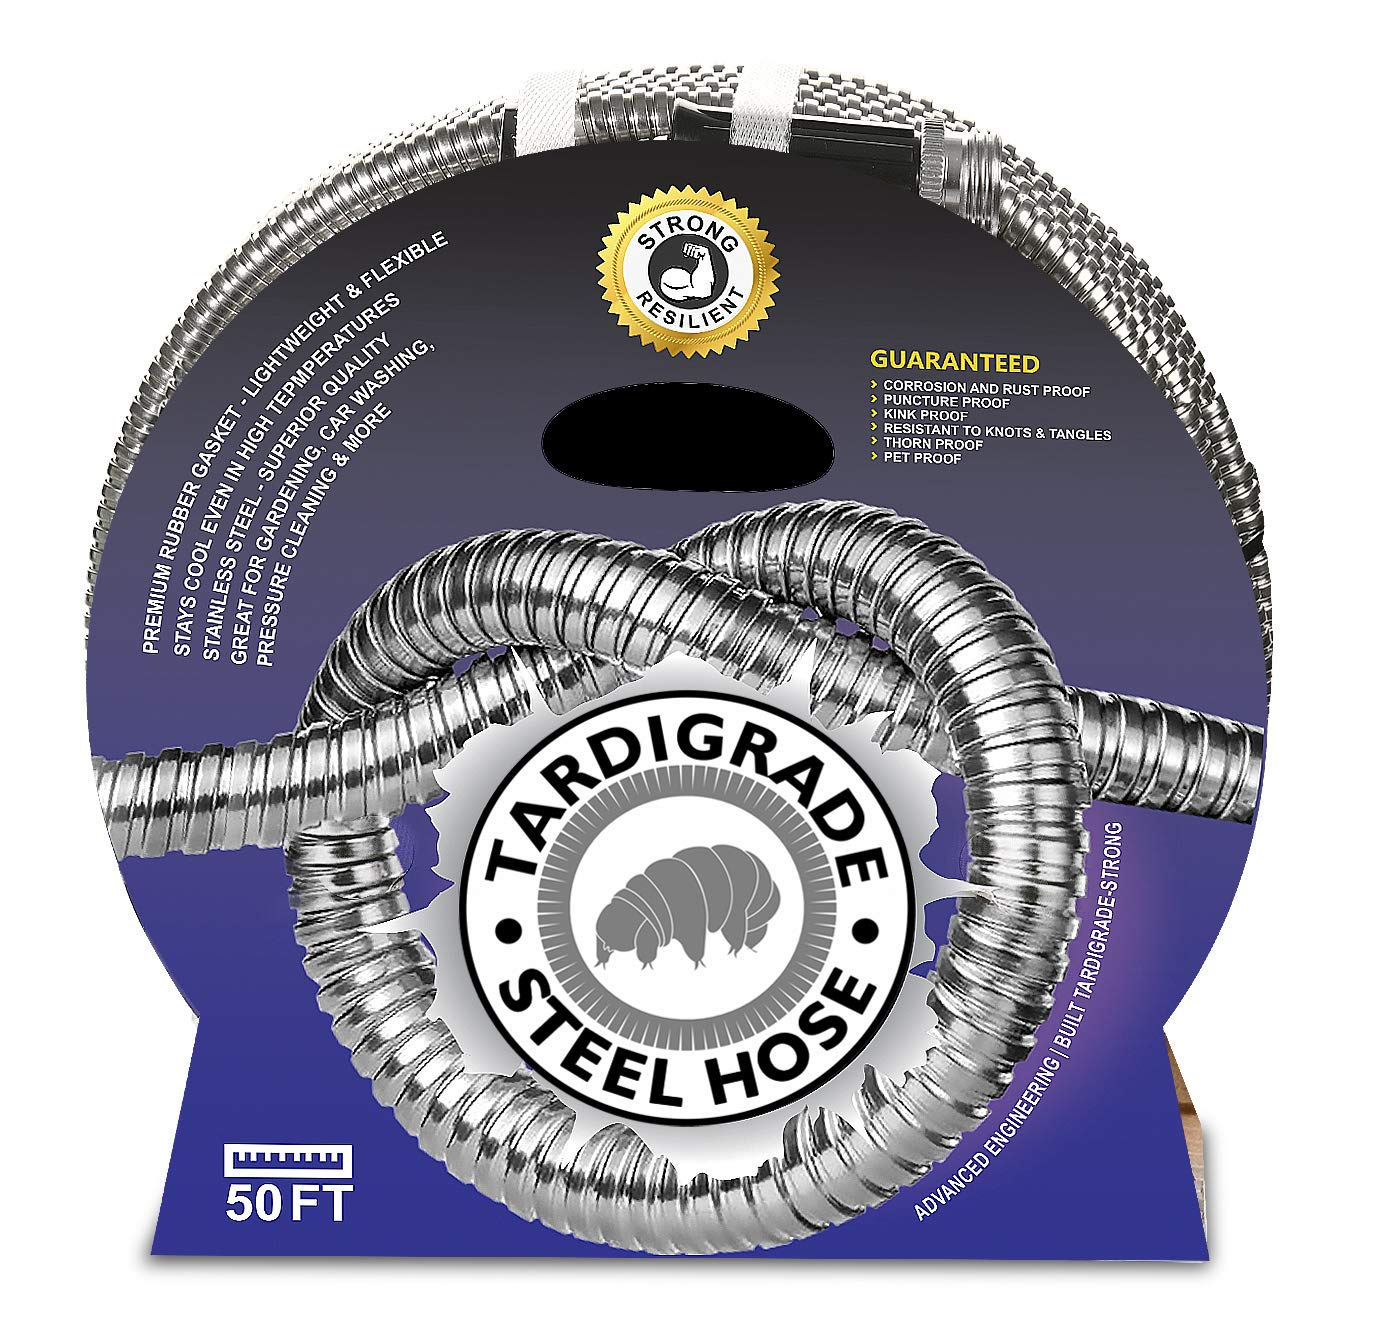 Specilite Heavy Duty 75 Foot Stainless Steel 10 Spray Pattern Nozzle Garden Hose